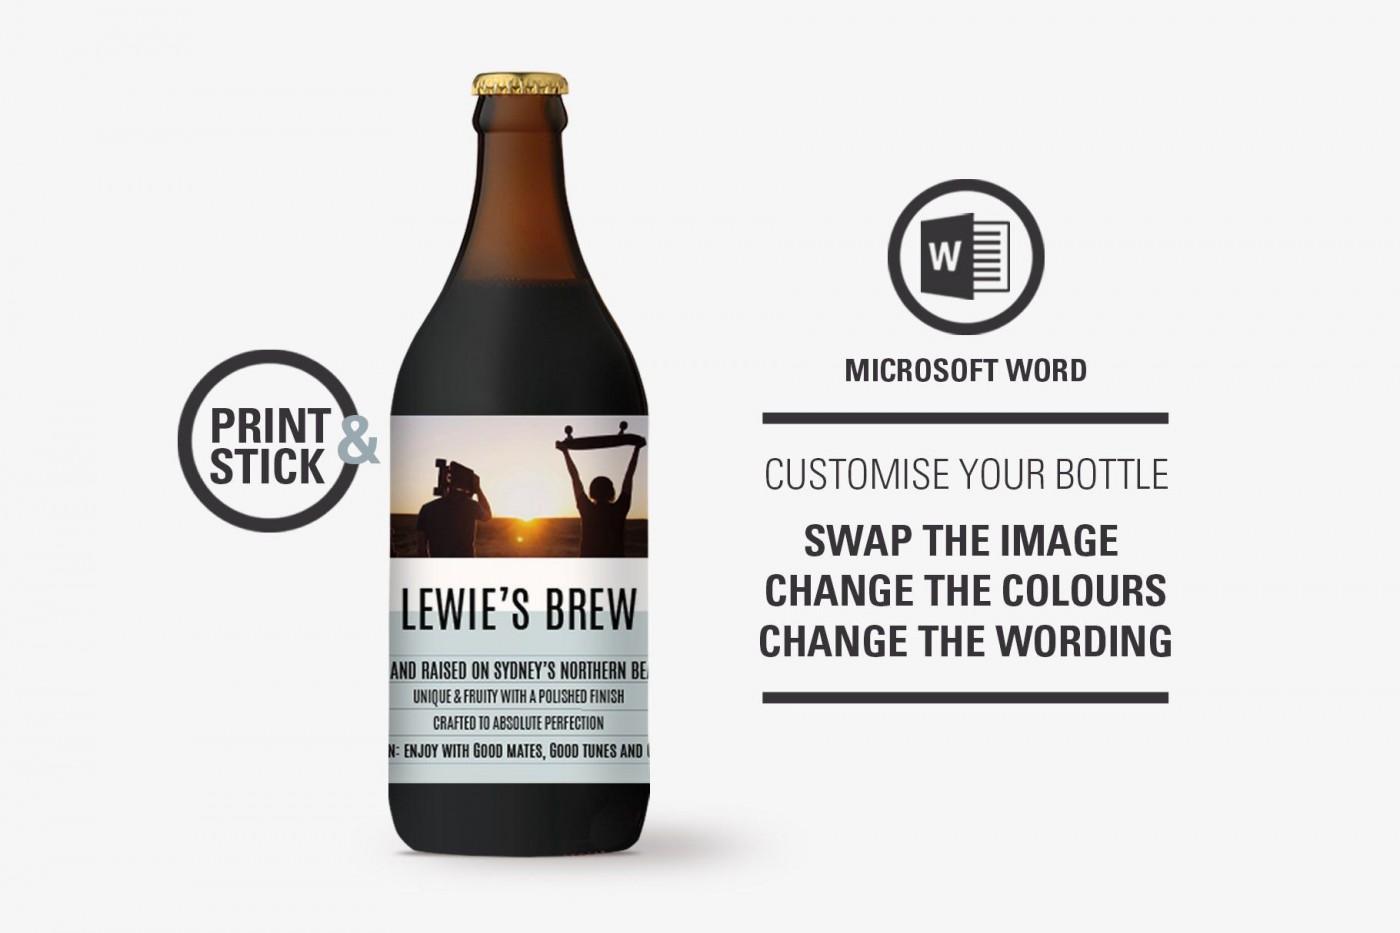 005 Stunning Microsoft Word Beer Label Template Sample  Bottle1400